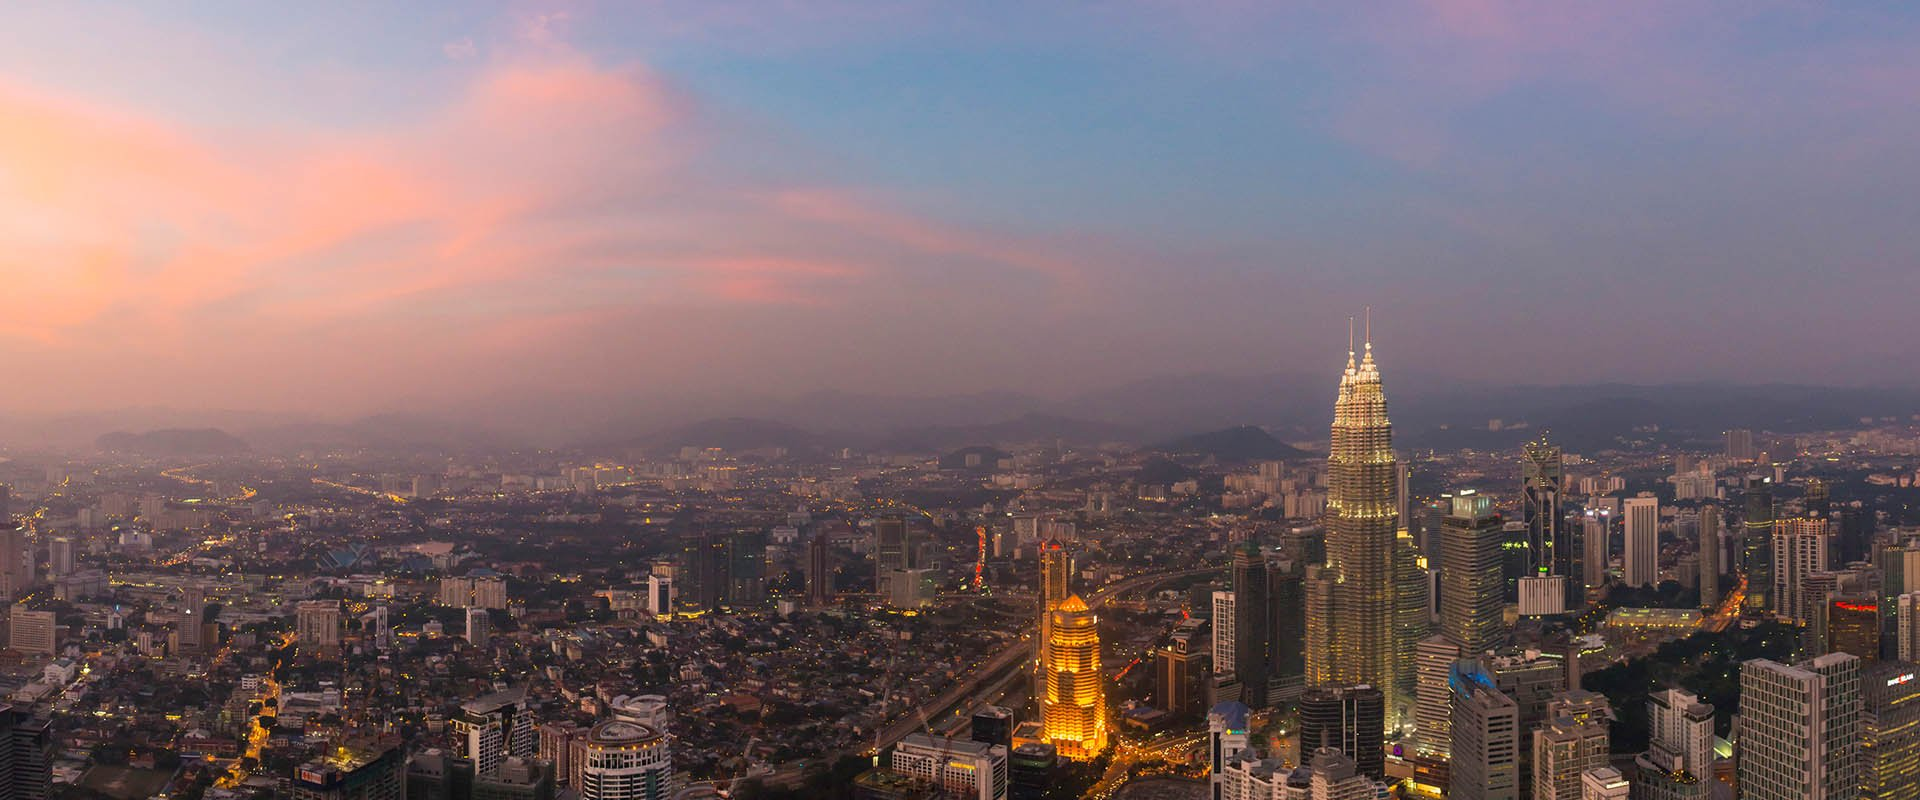 Kuala Lumpur Public Holidays 2018 Publicholidays Com My